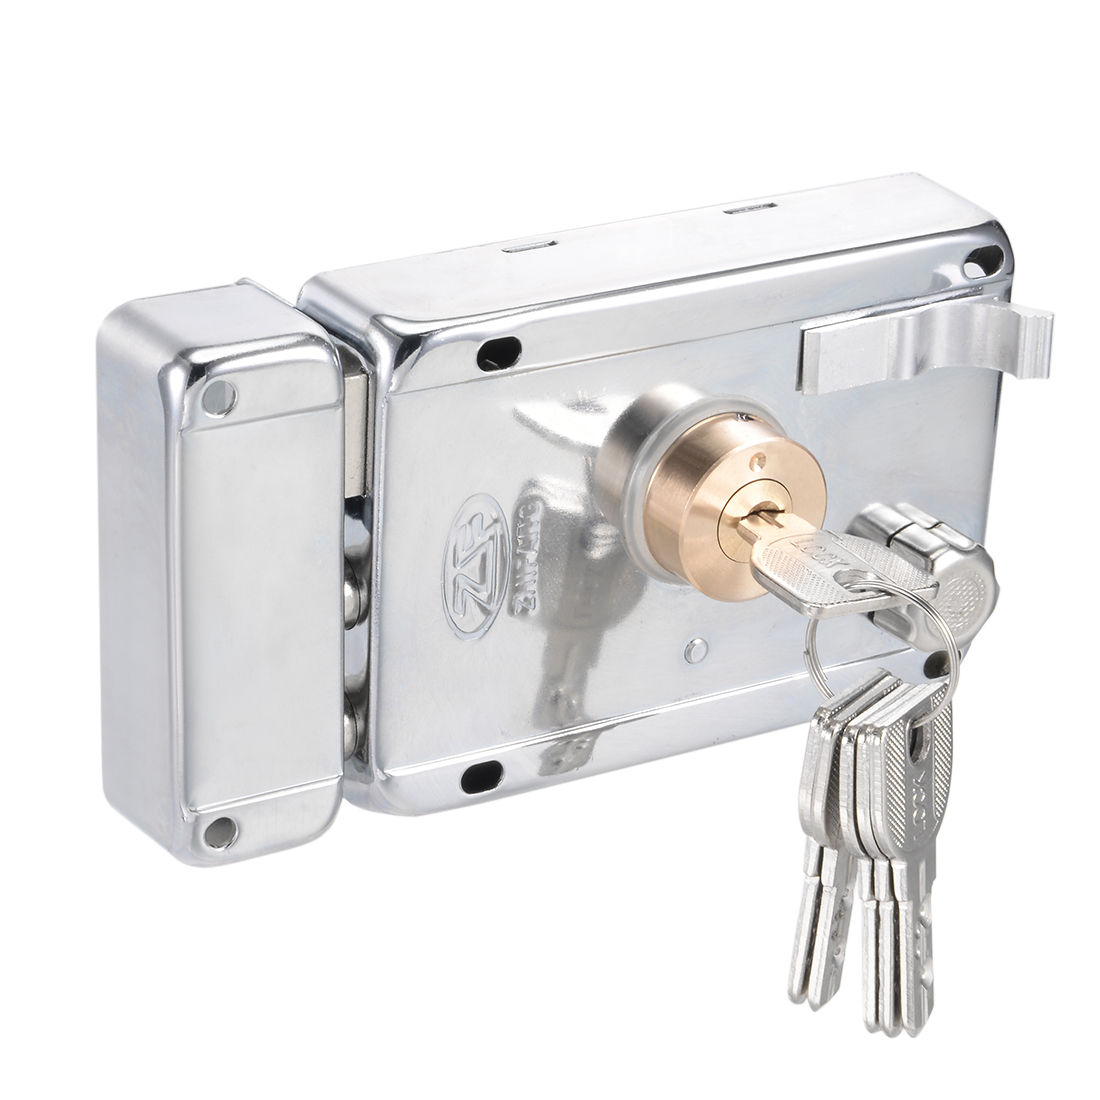 120mmx85mm Alloy Steel Brass Cylinder Door Right Hand Rim Lock w Dimple Key